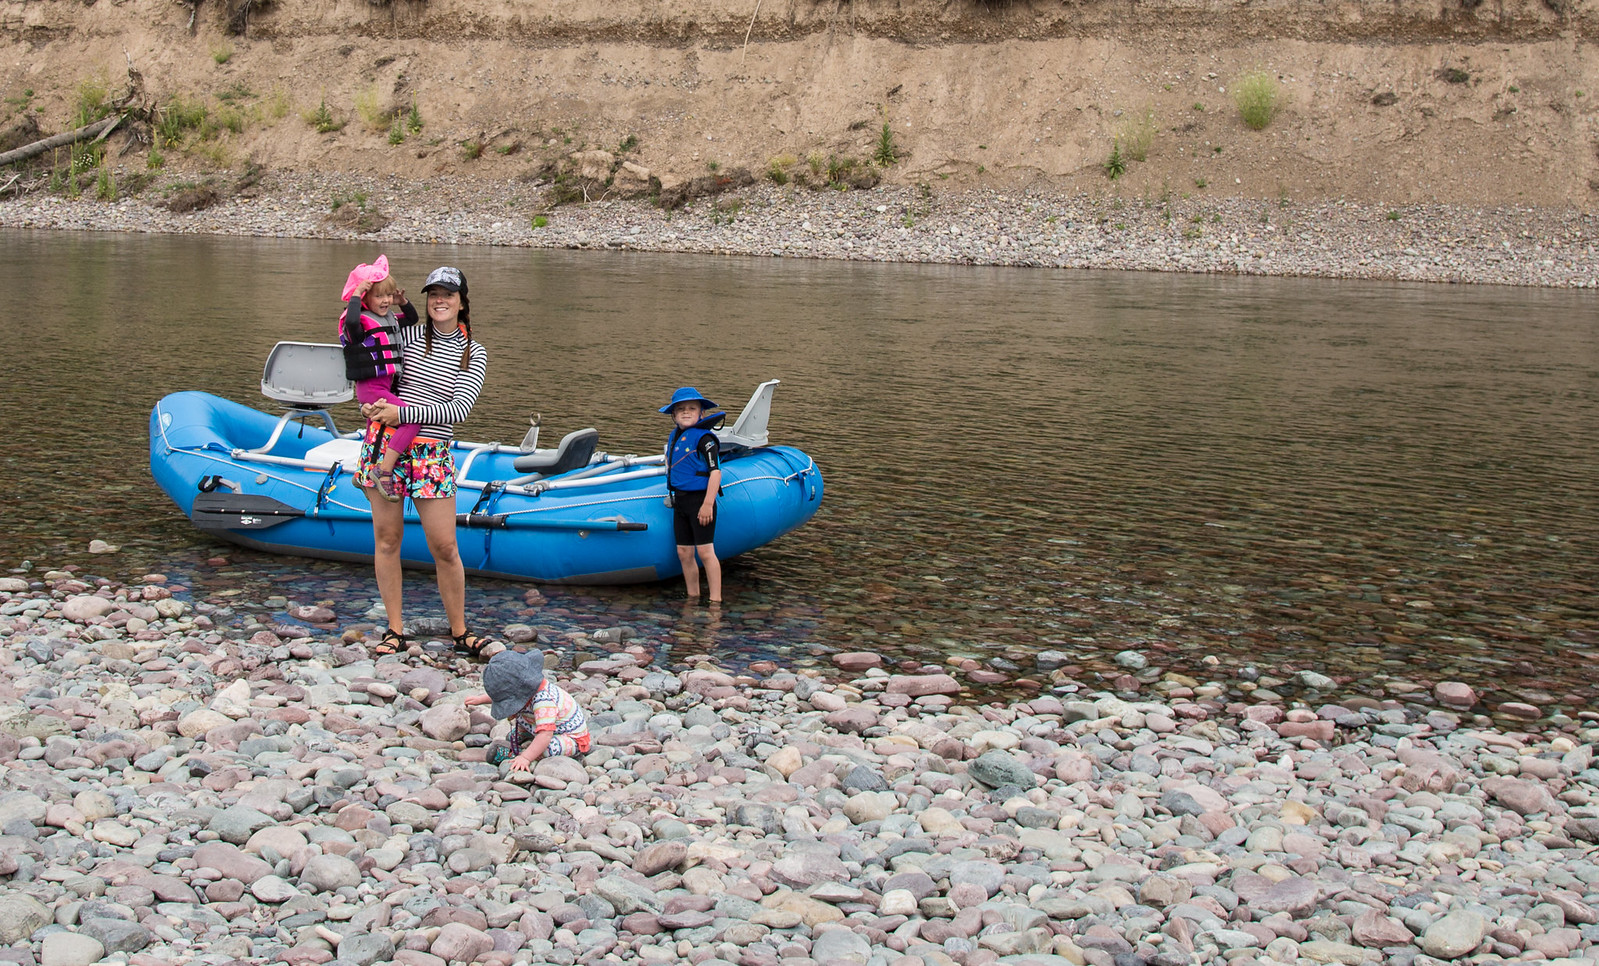 2015-07-10 Whitefish KOA and Float-9920.jpg